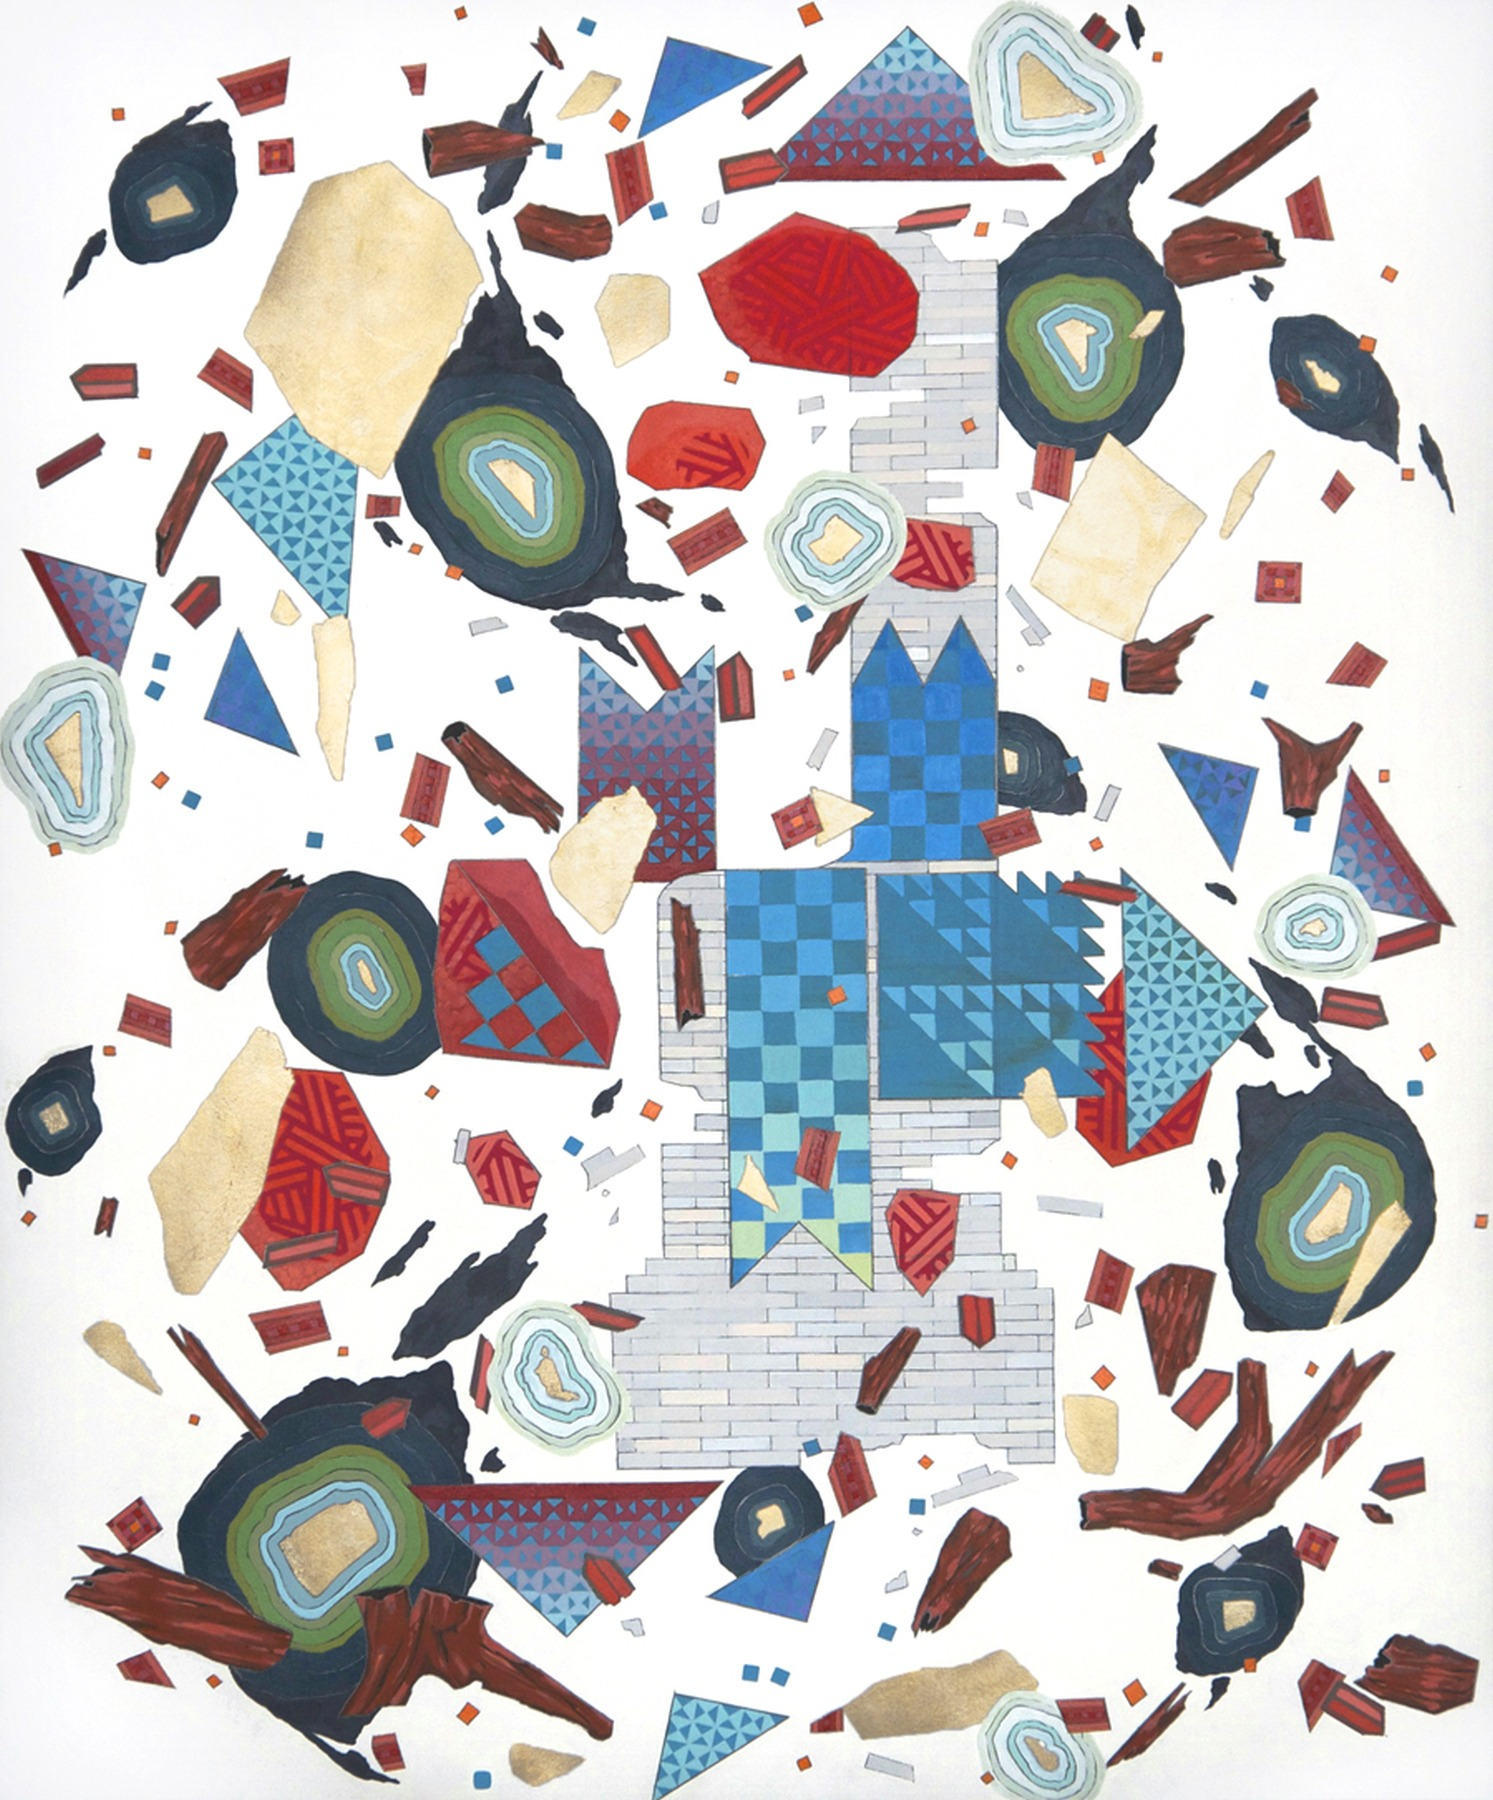 """Demo: Facade"" by Sage Dawson"